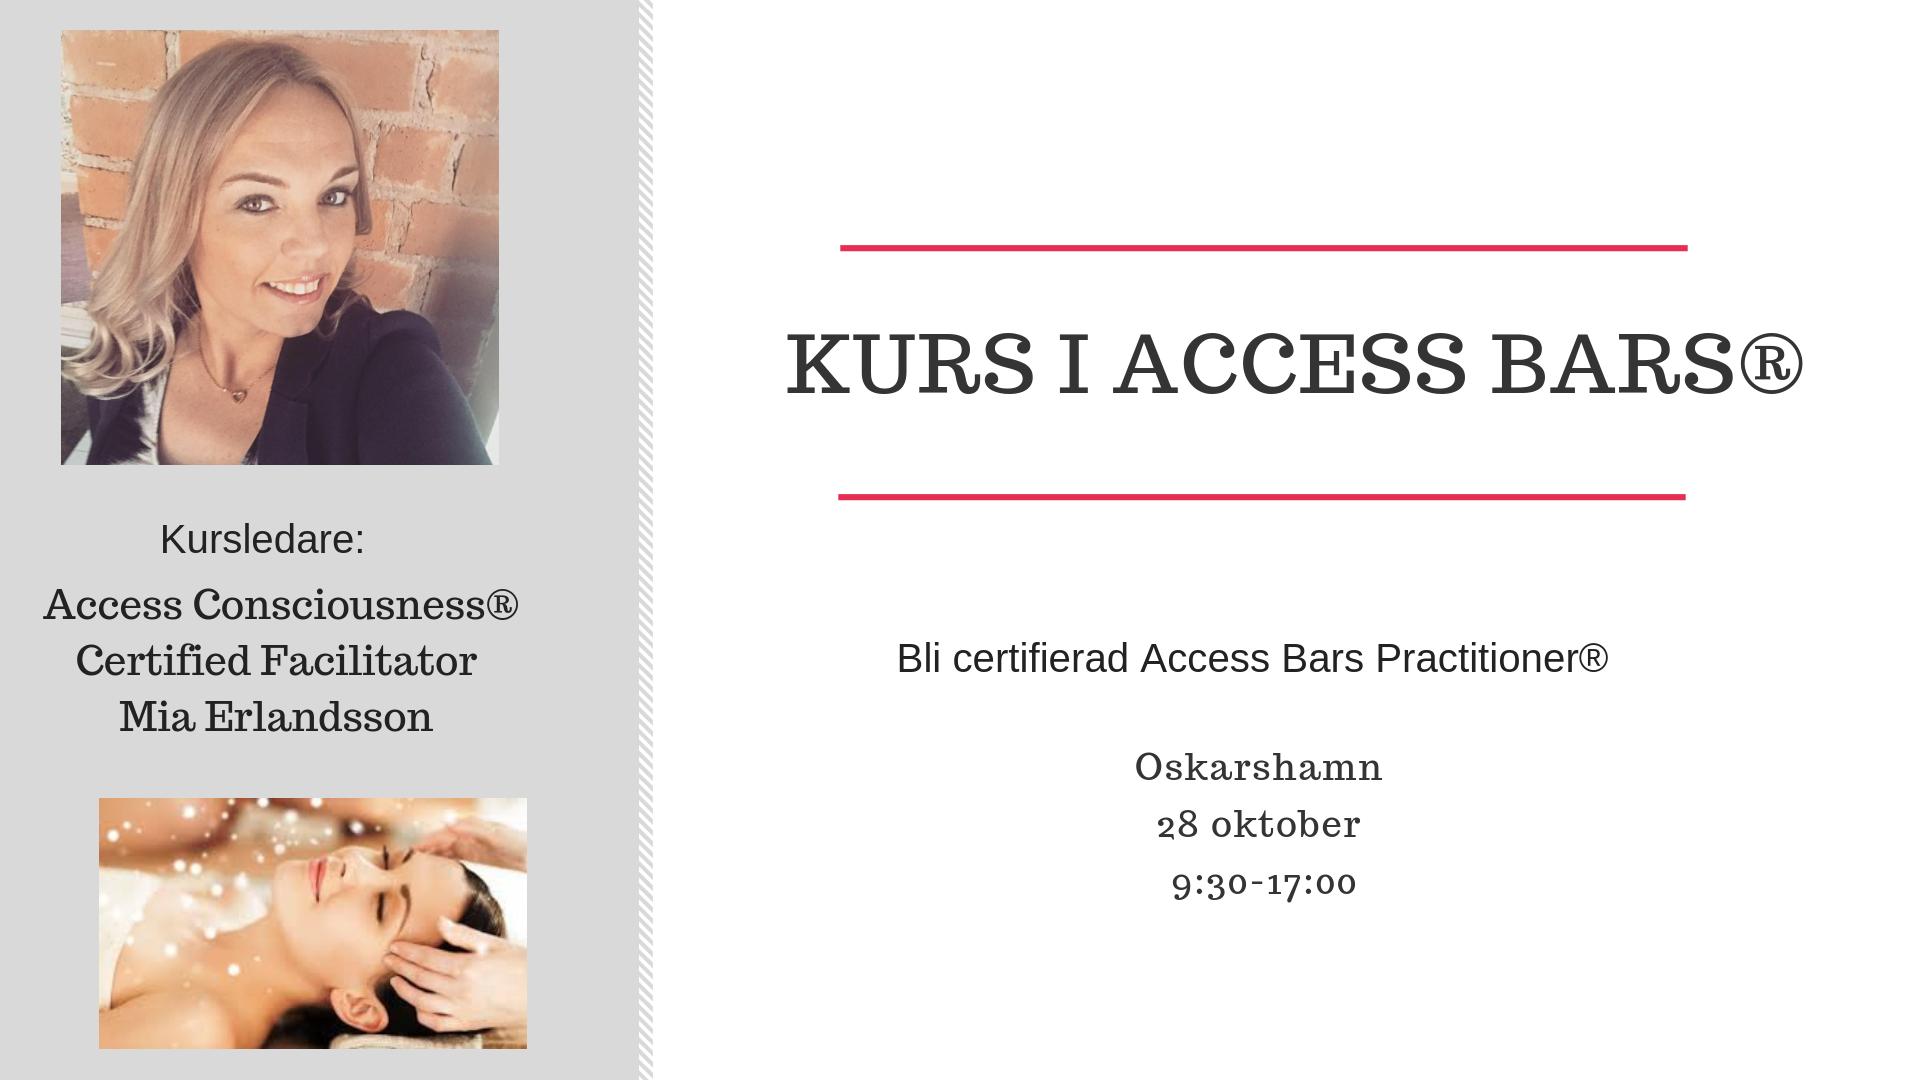 kurs i Access Bars®